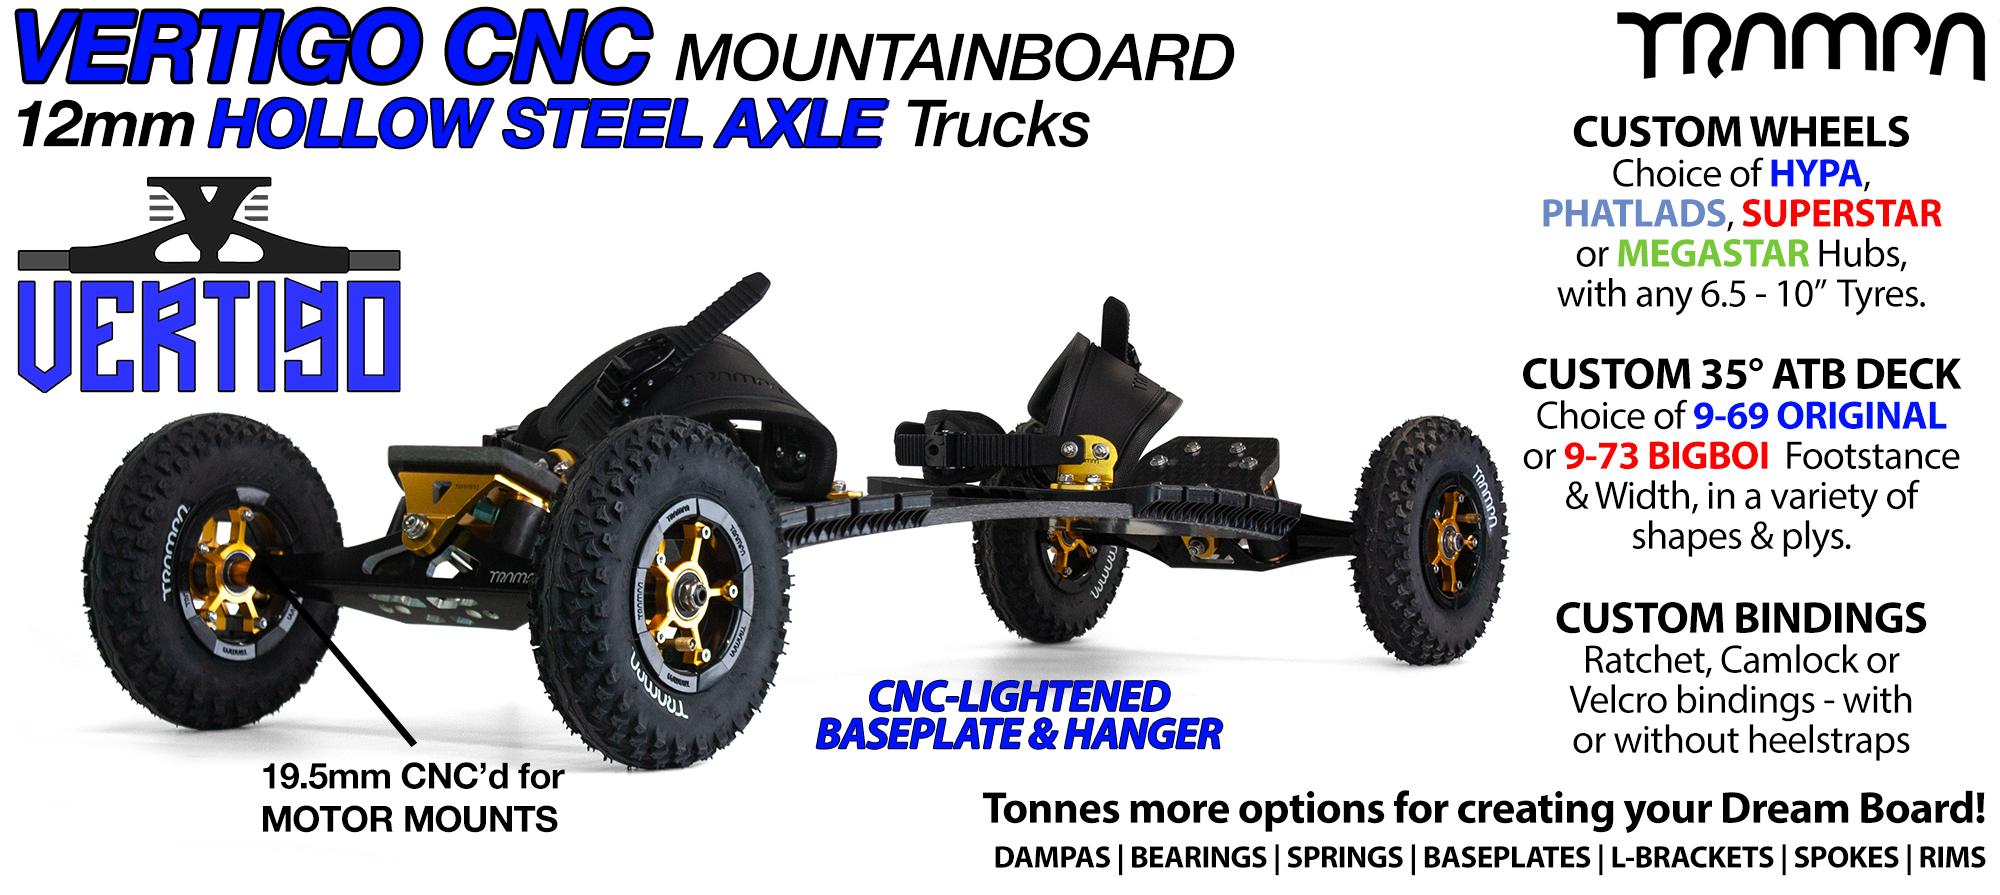 TRAMPA Mountainboard with 12mm HOLLOW Axle VERTIGO Trucks RATCHET Bindings & Custom Wheels